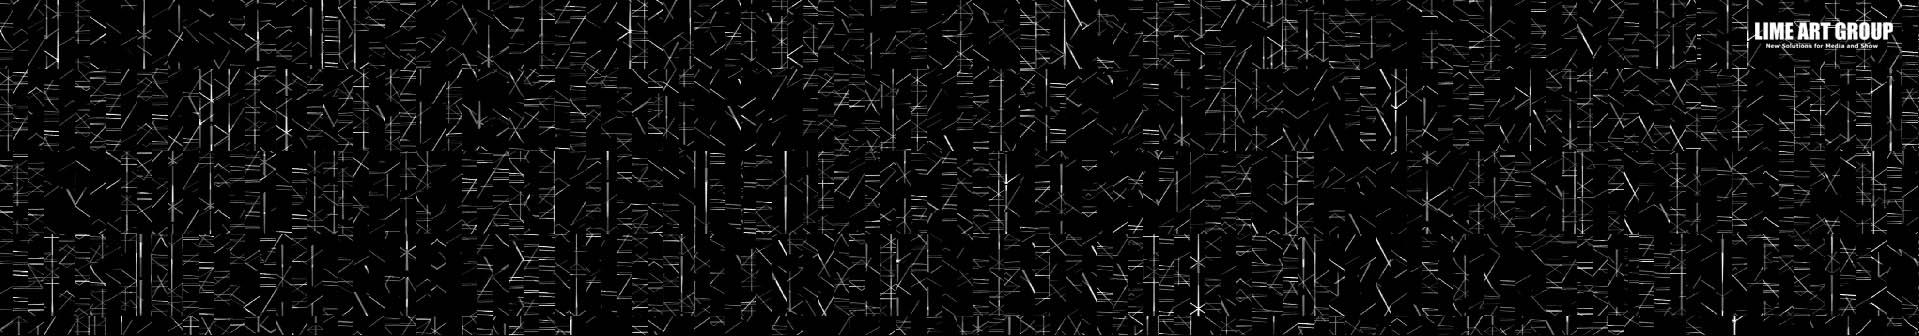 candy vj loops motion background video loop 8